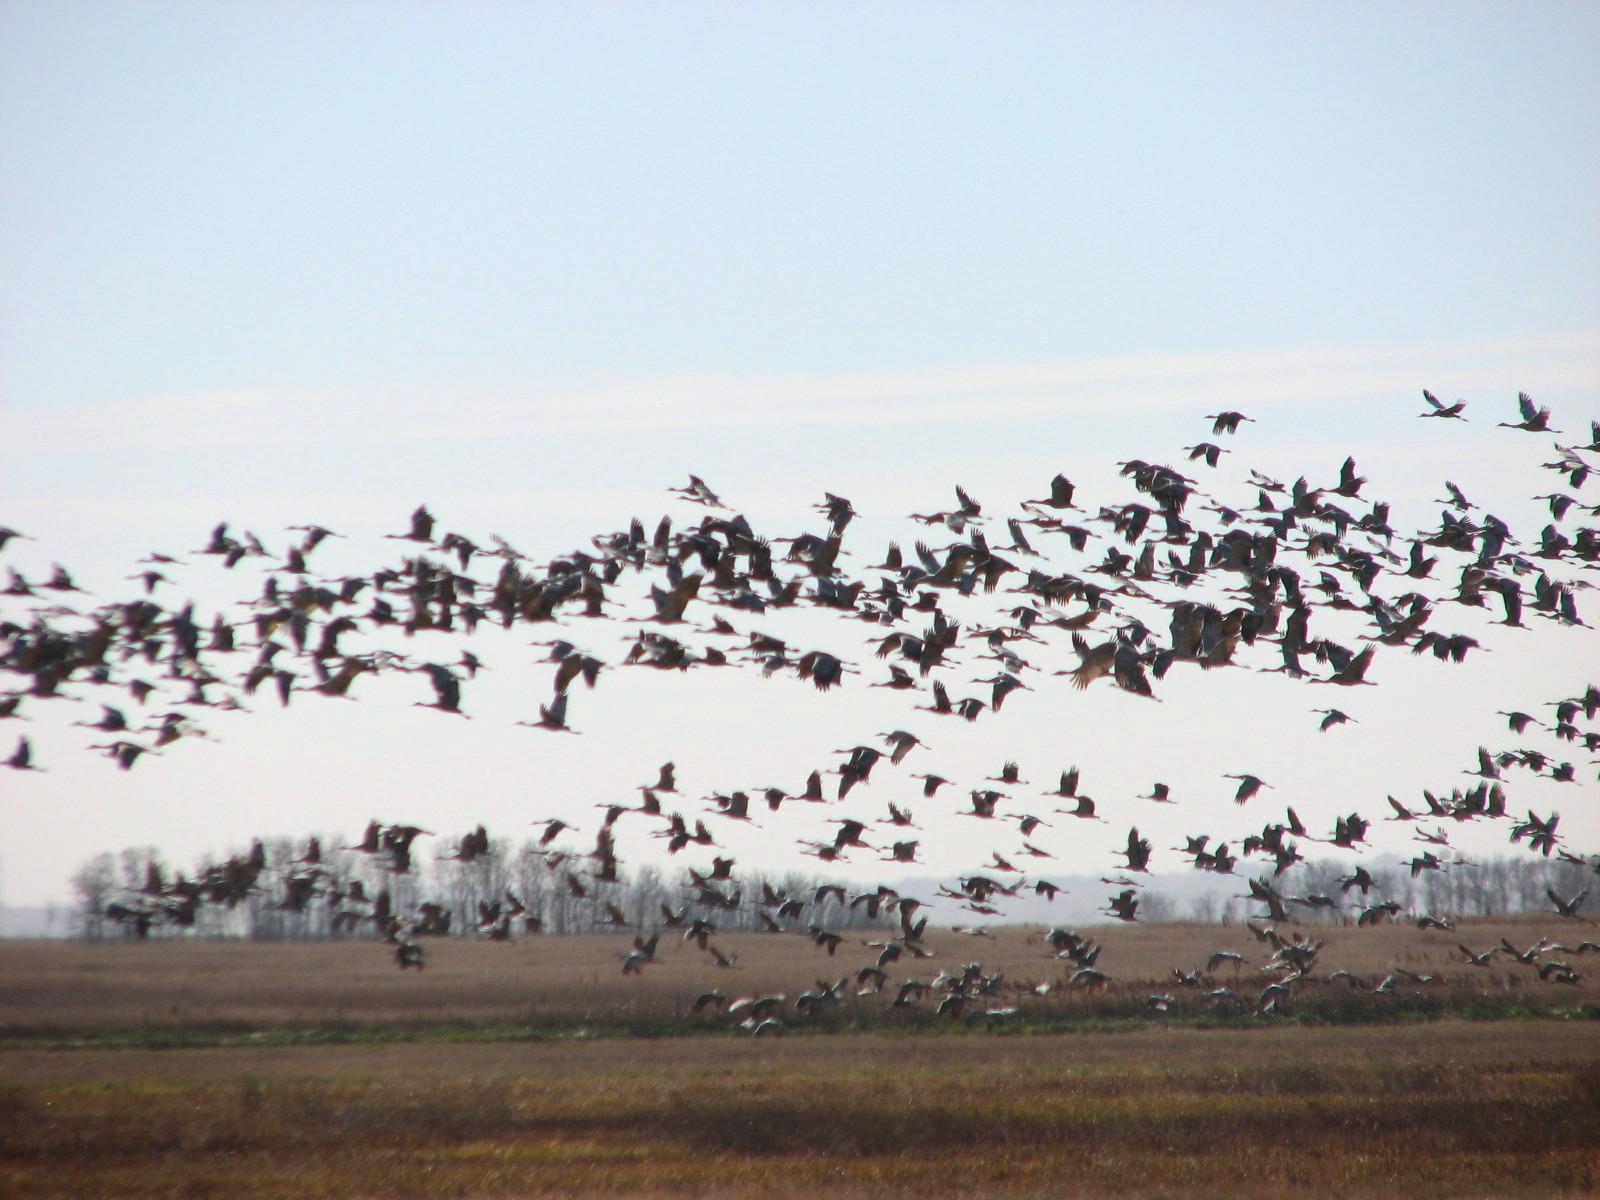 Still Life With Birder: More Sandhill Cranes - Saying Goodbye